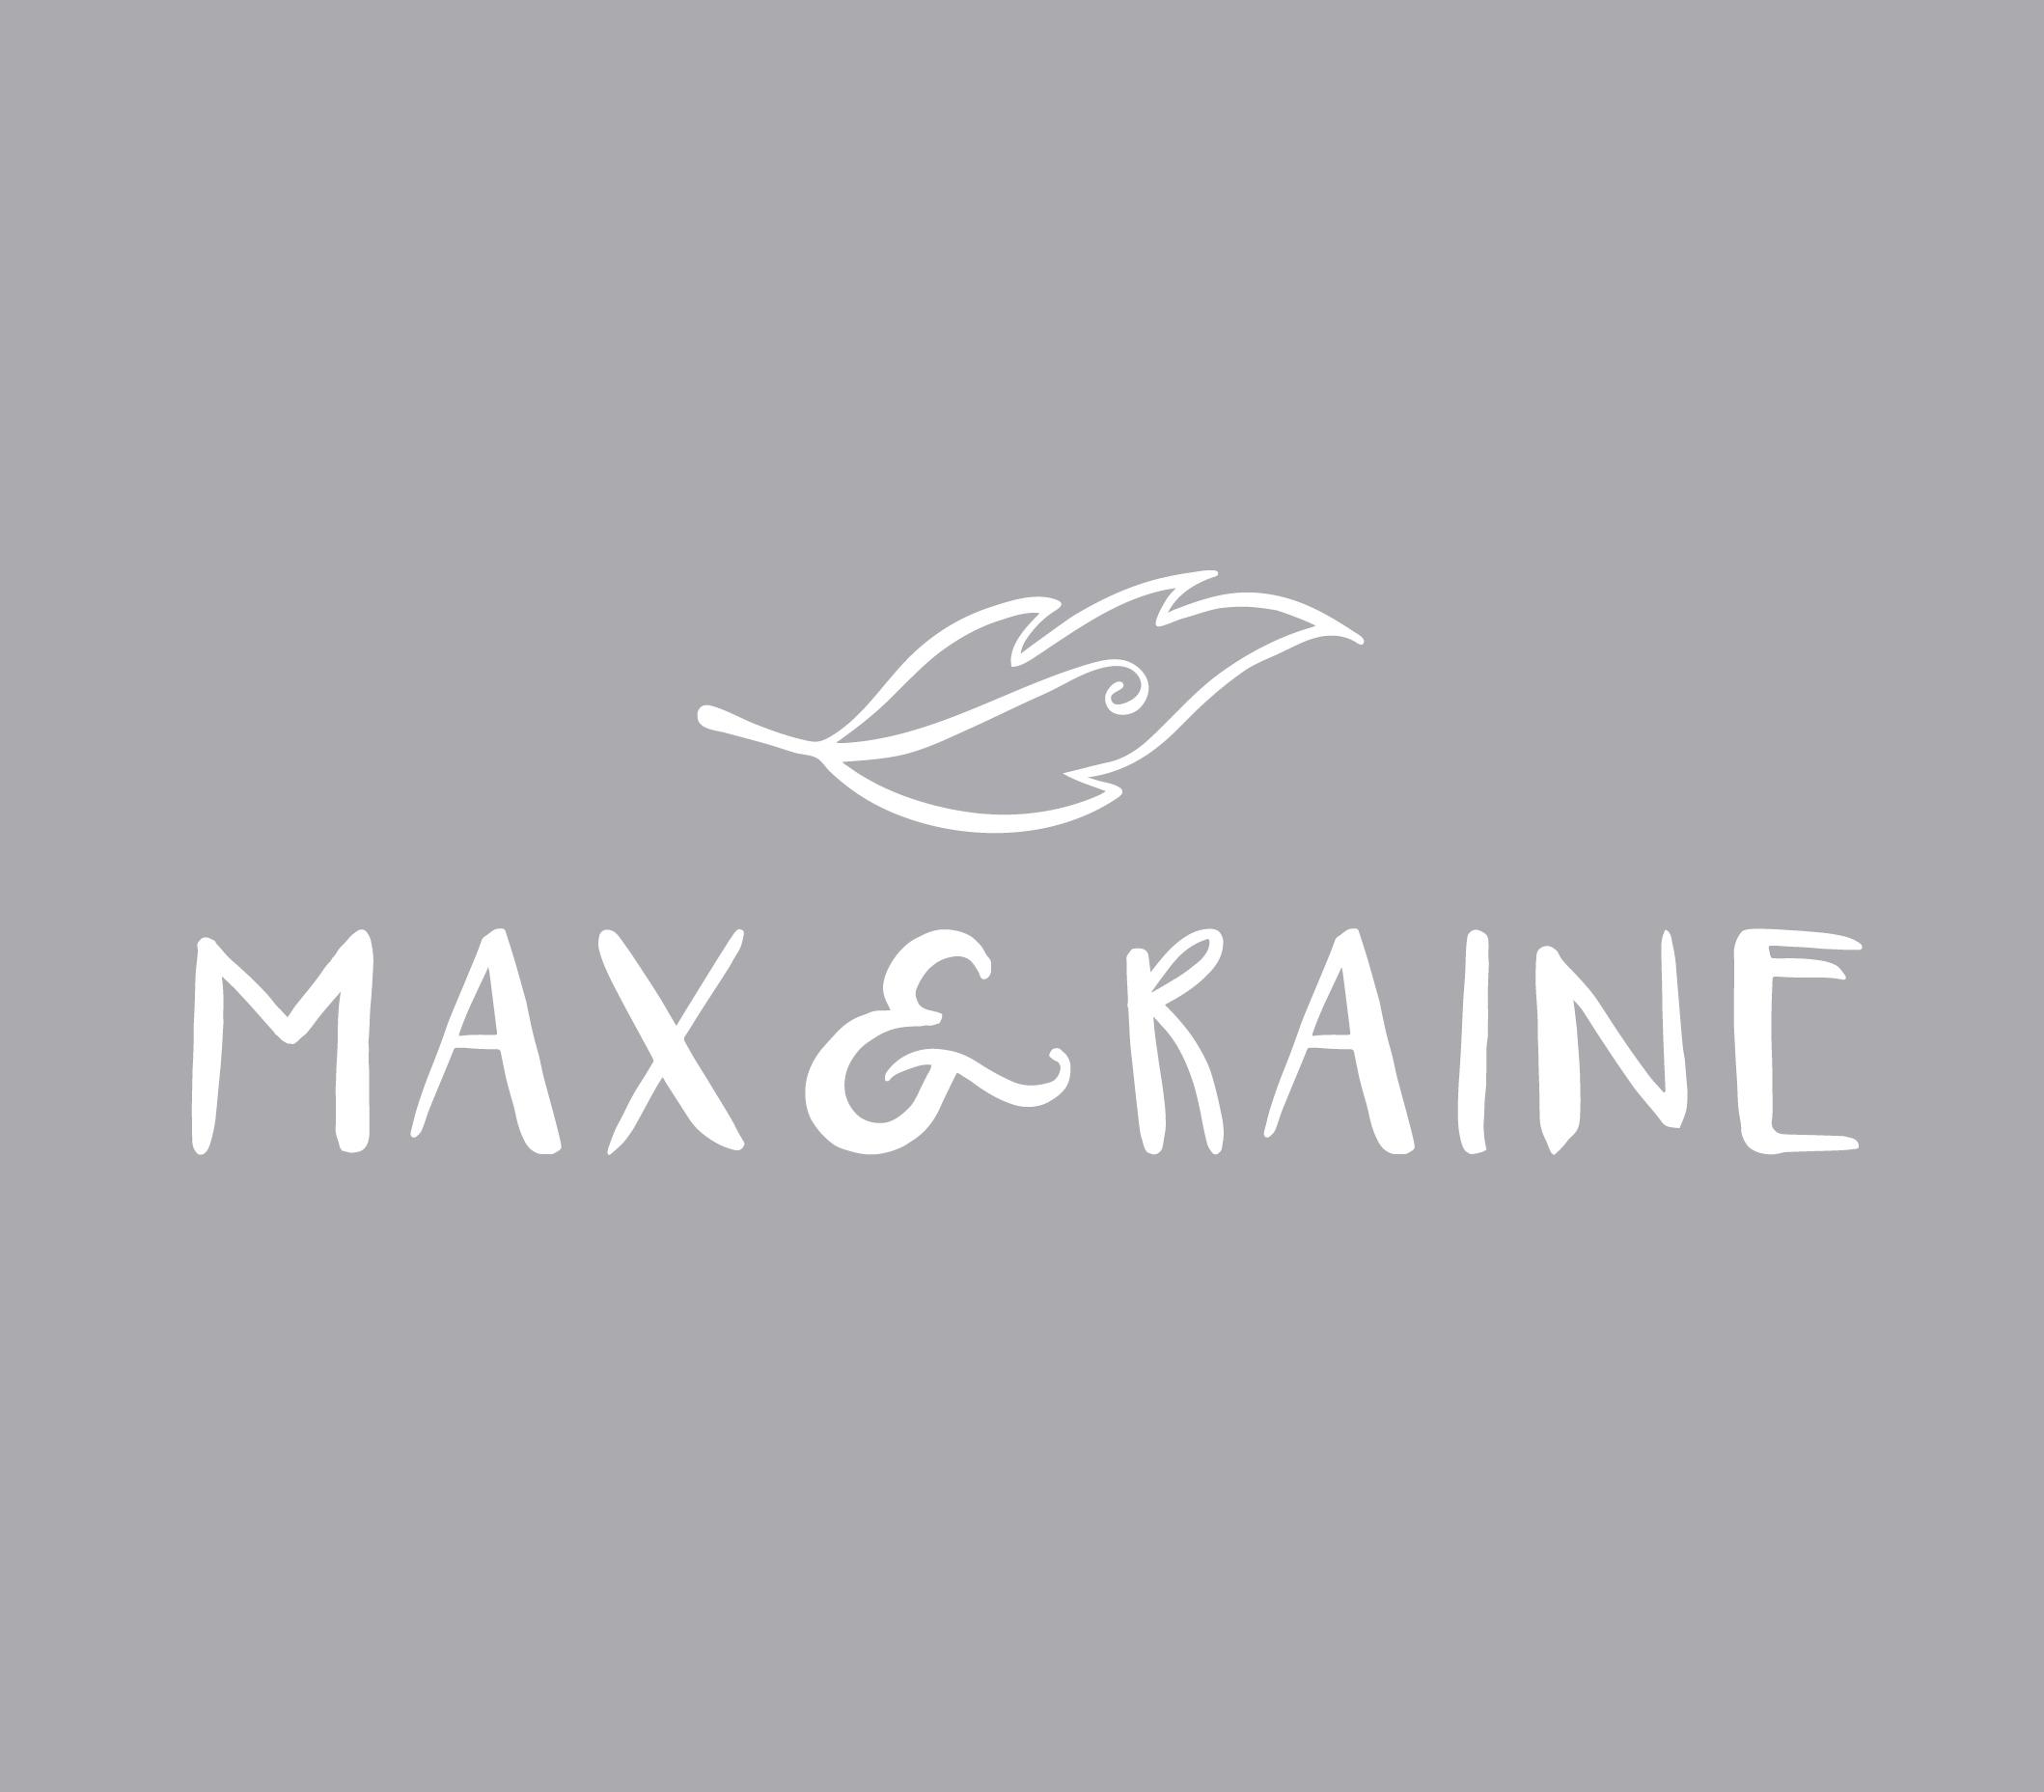 Max & Raine logo design - Logo design featuring hand drawn feather